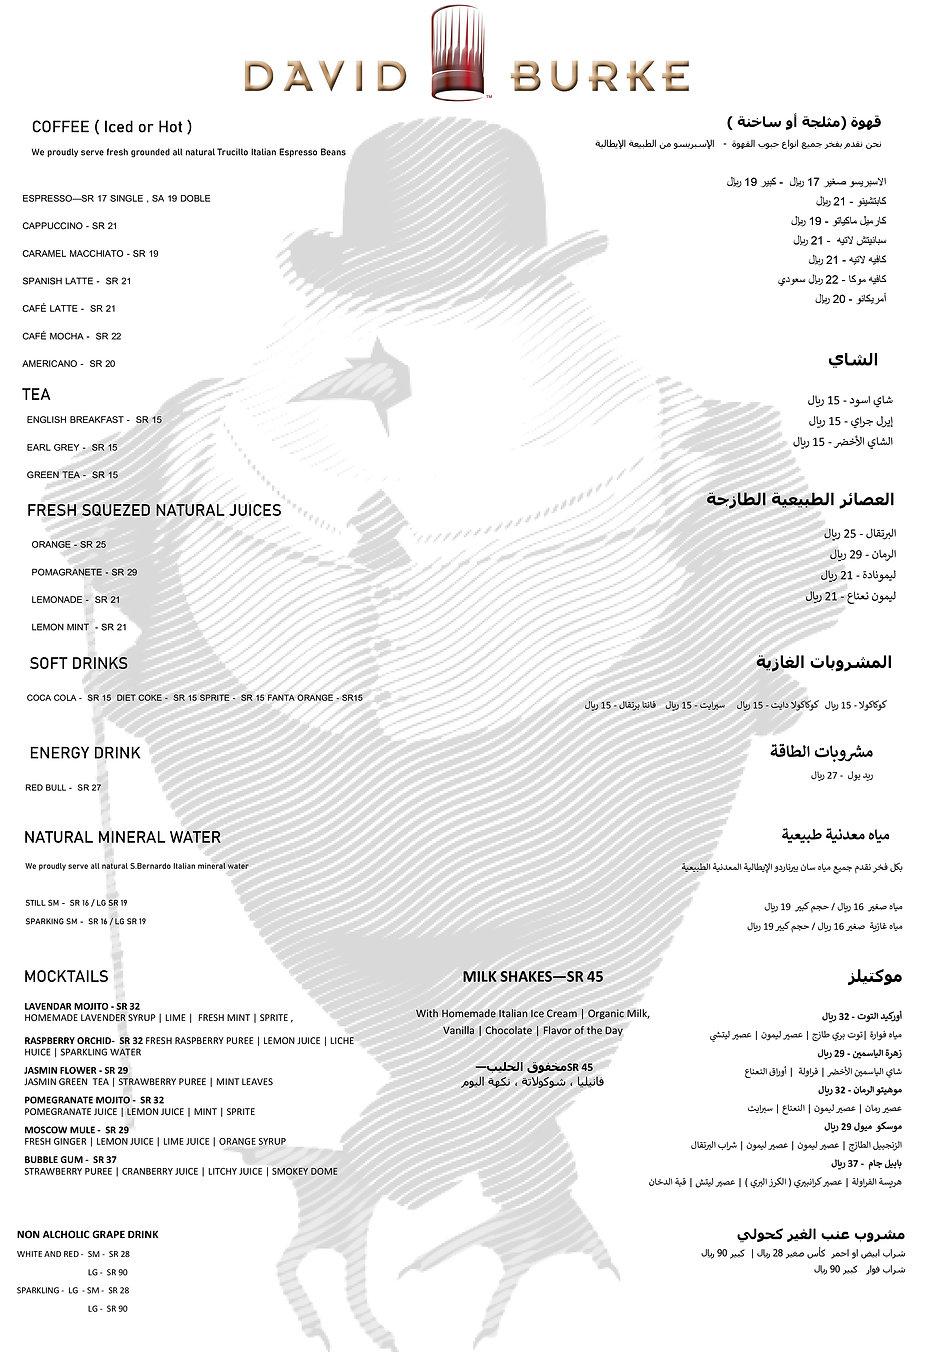 00 7-9-2021DAVID BURKE MENU drinks.jpg